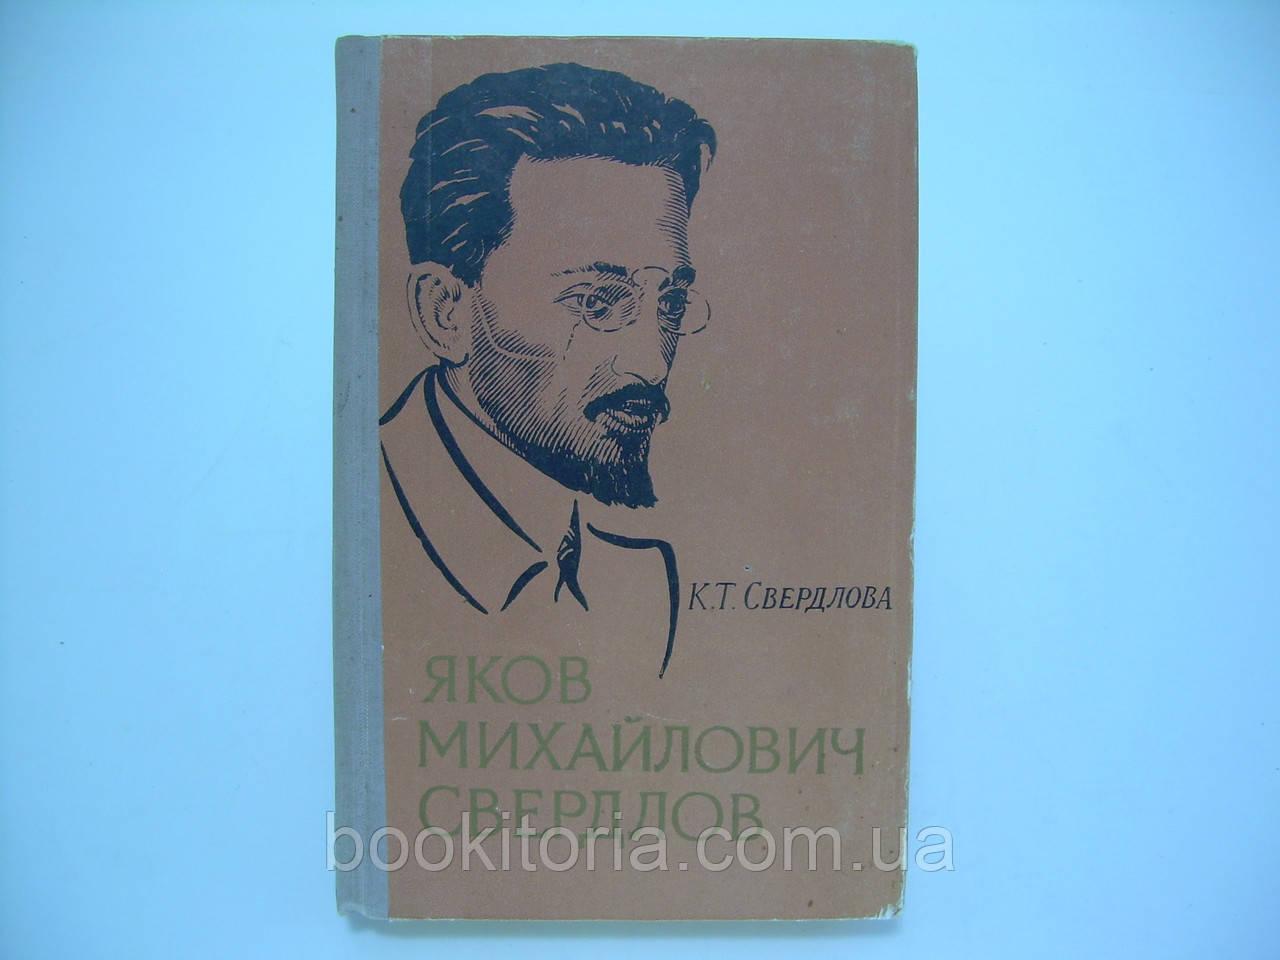 Свердлова К.Т. Яков Михайлович Свердлов (б/у).